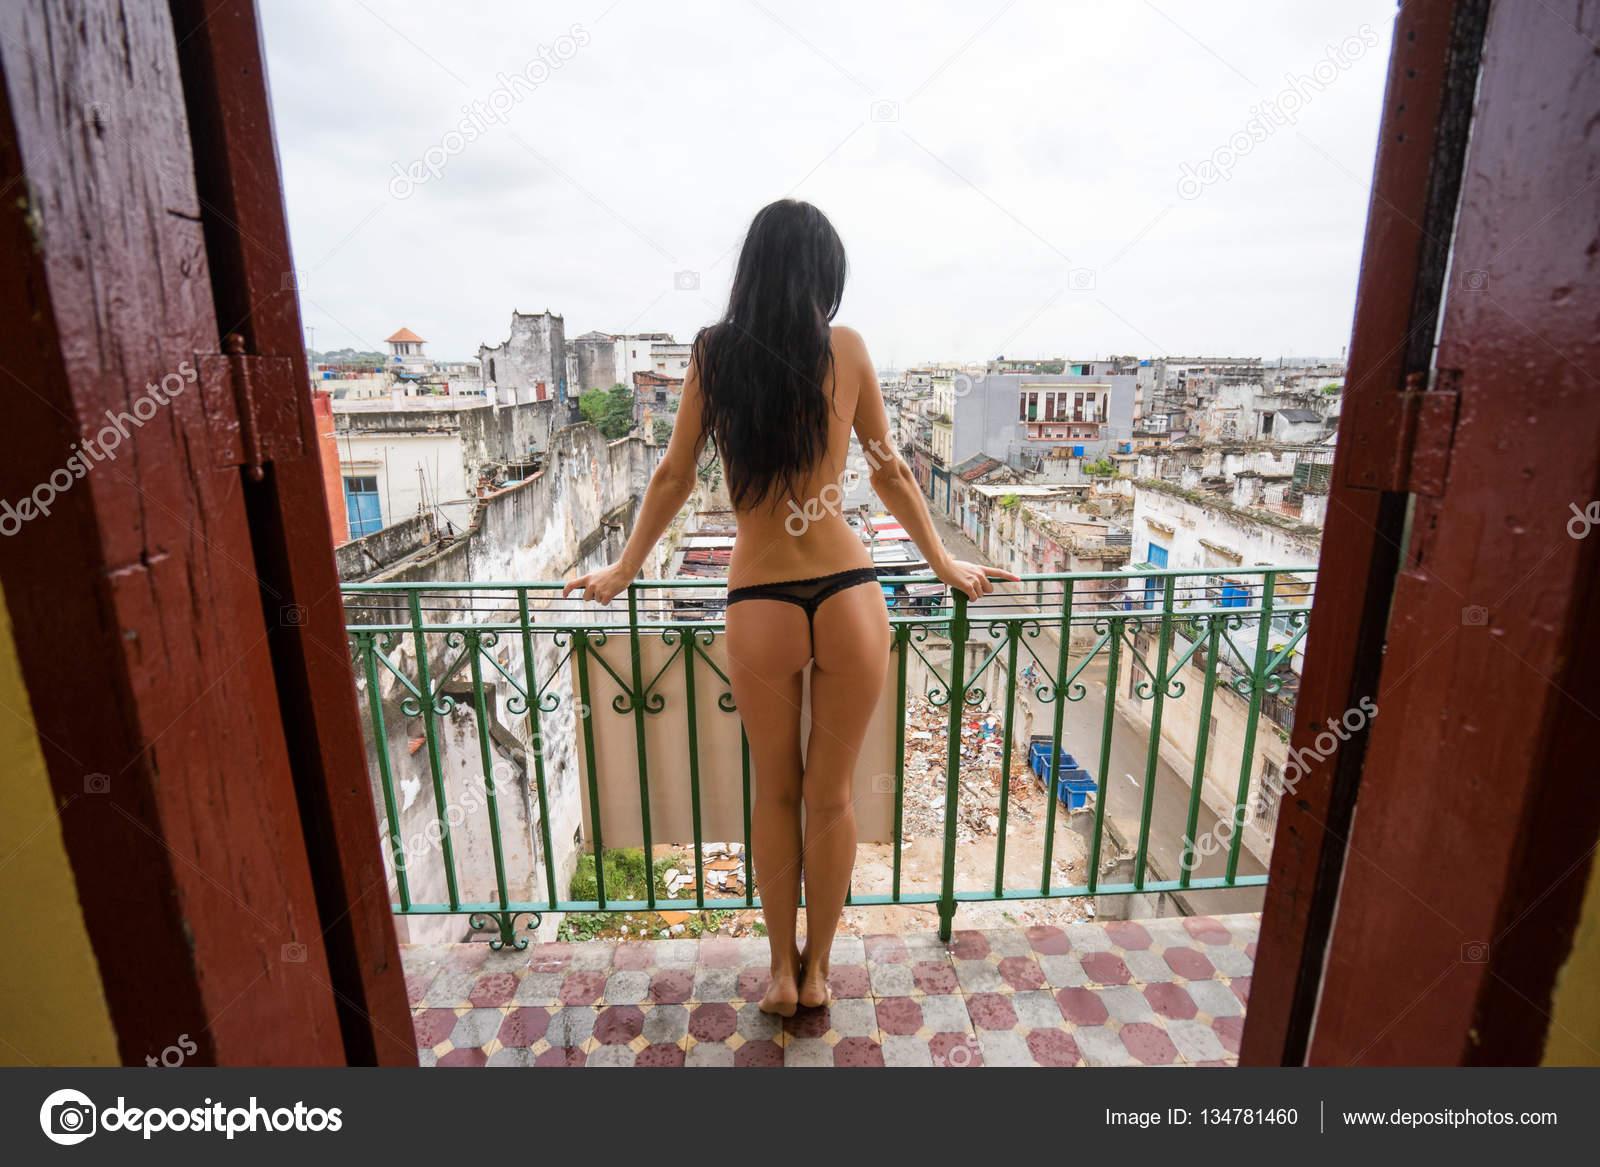 fotografii-visokih-golih-zhenshin